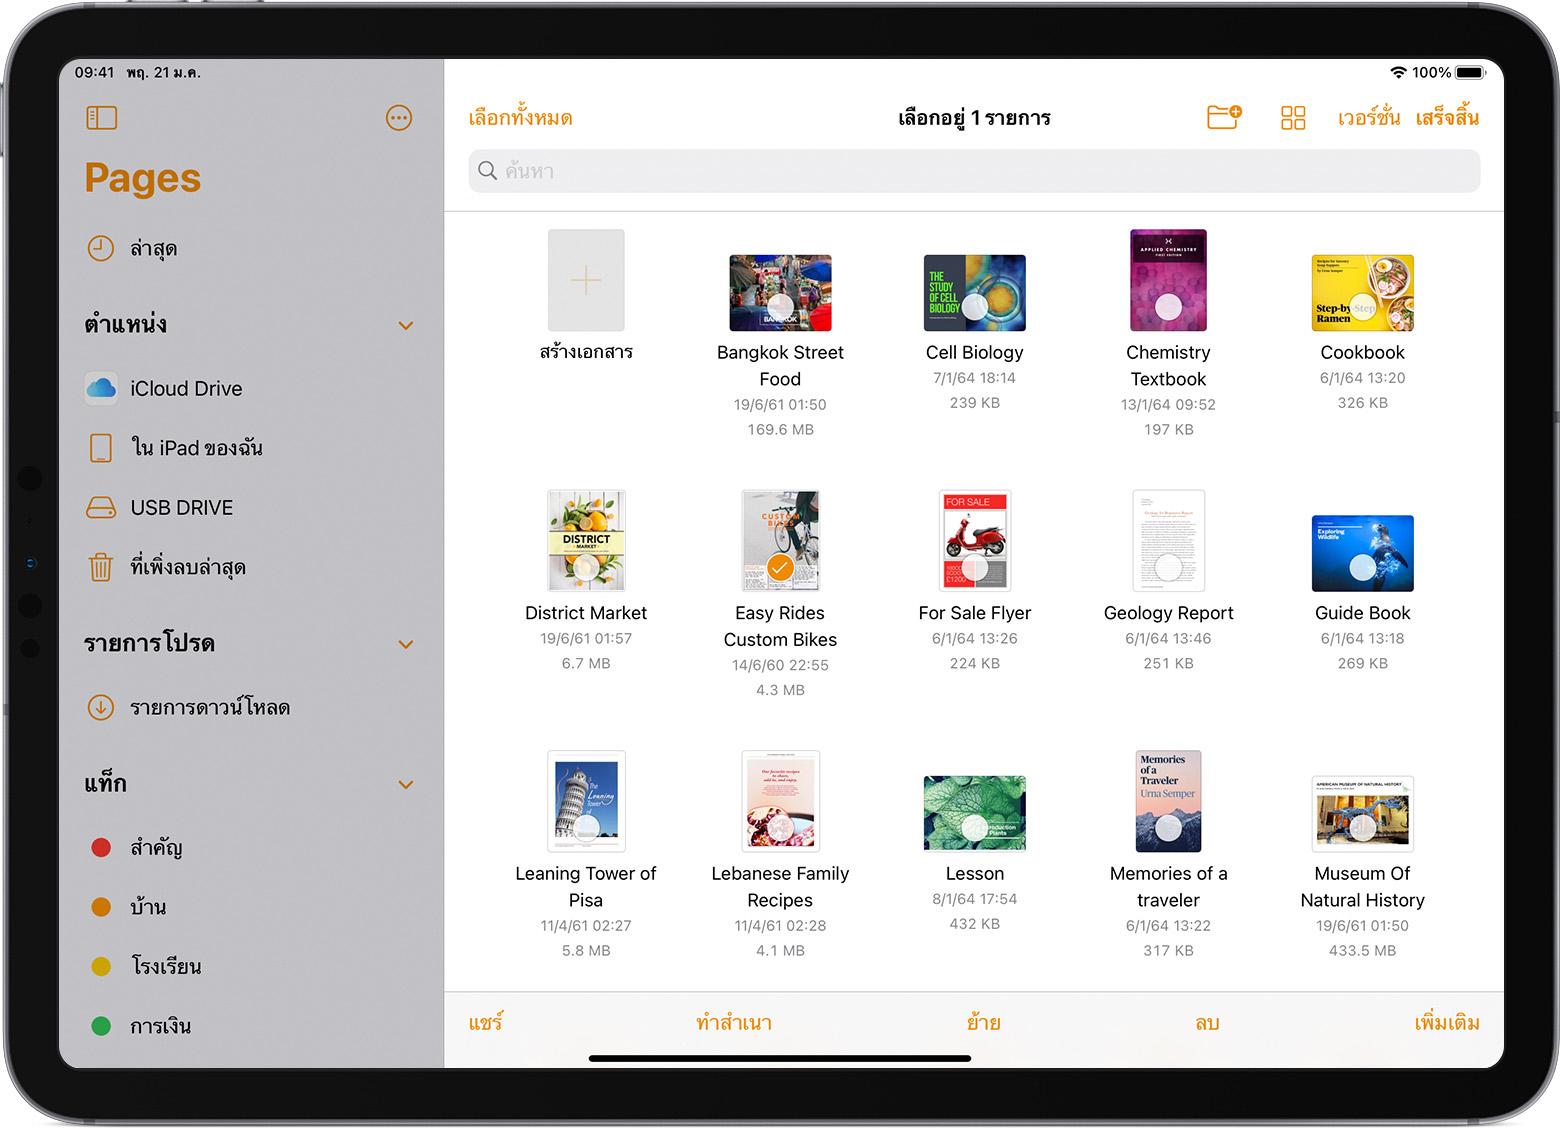 iPad Pro ที่เปิดหน้าต่างเลือกไฟล์ Pages และเลือกหนึ่งไฟล์อยู่